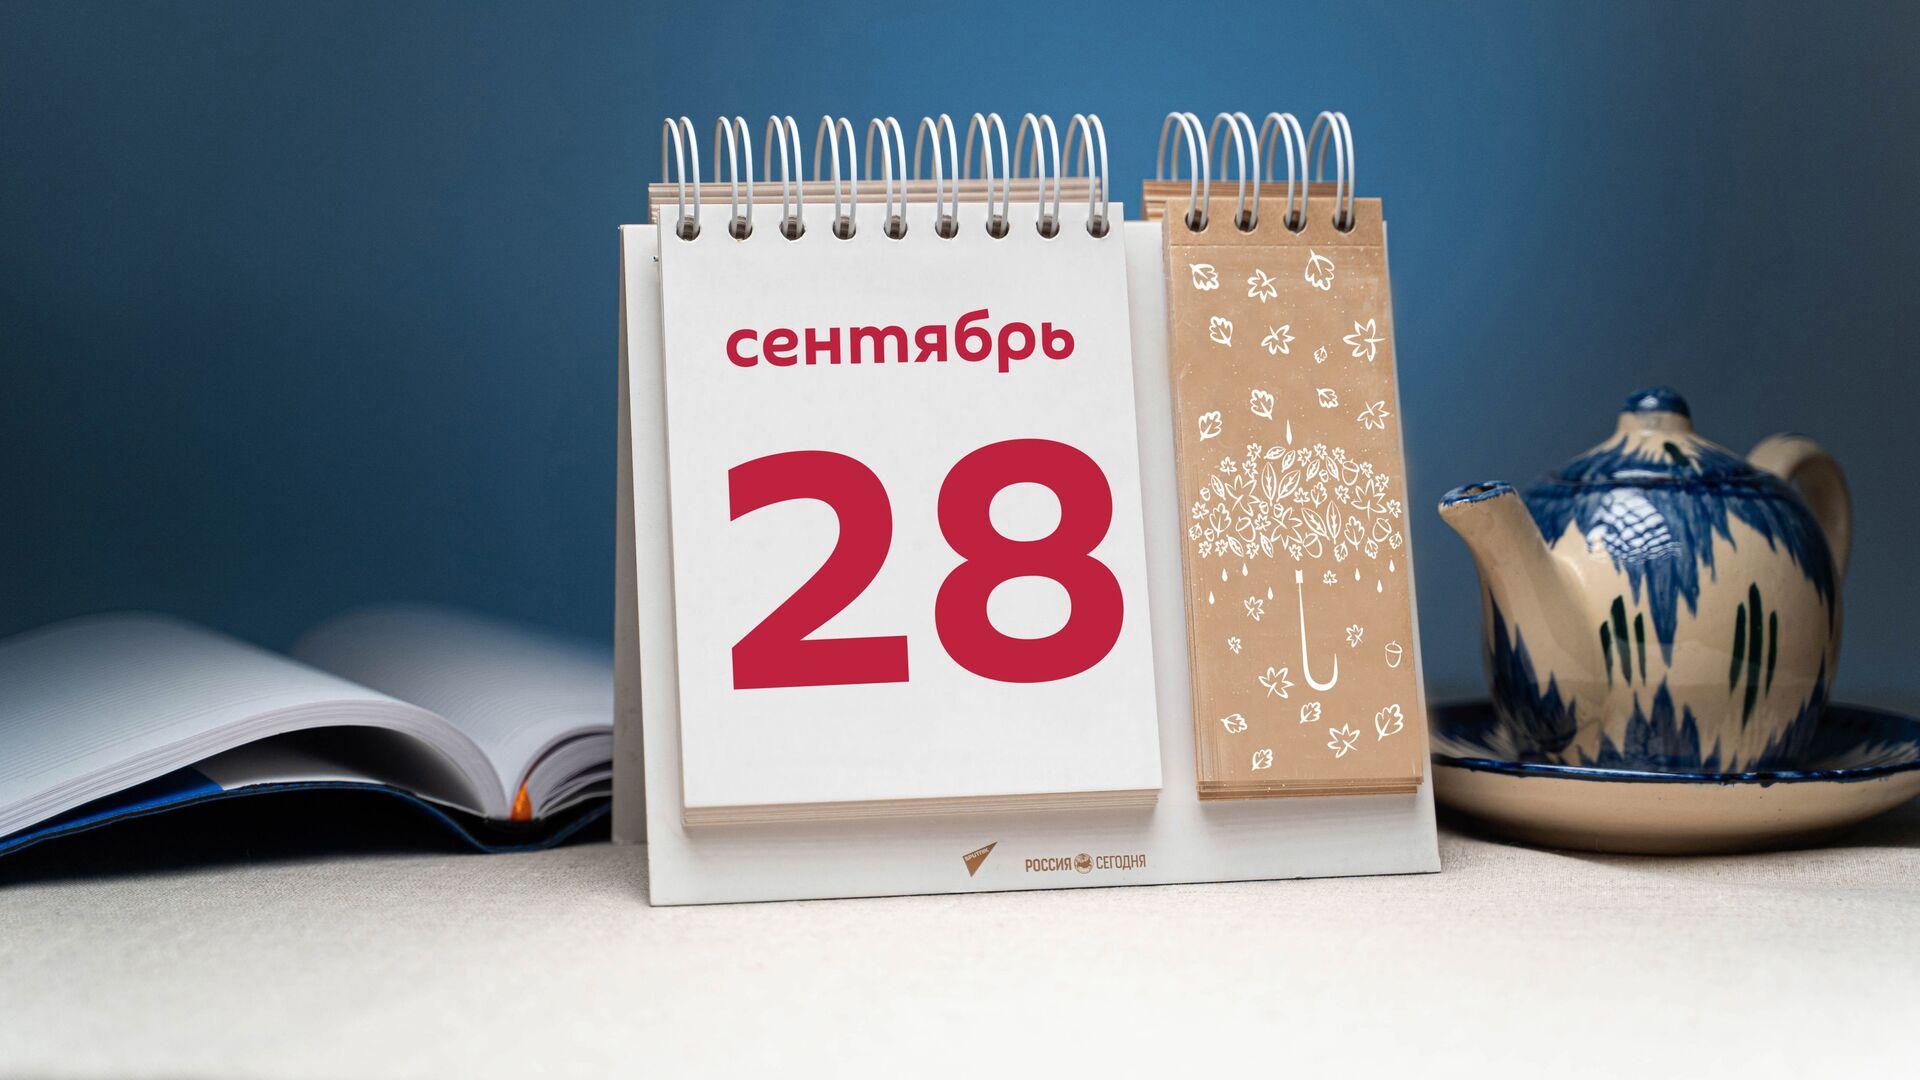 День 28 сентября - Sputnik Тоҷикистон, 1920, 28.09.2021